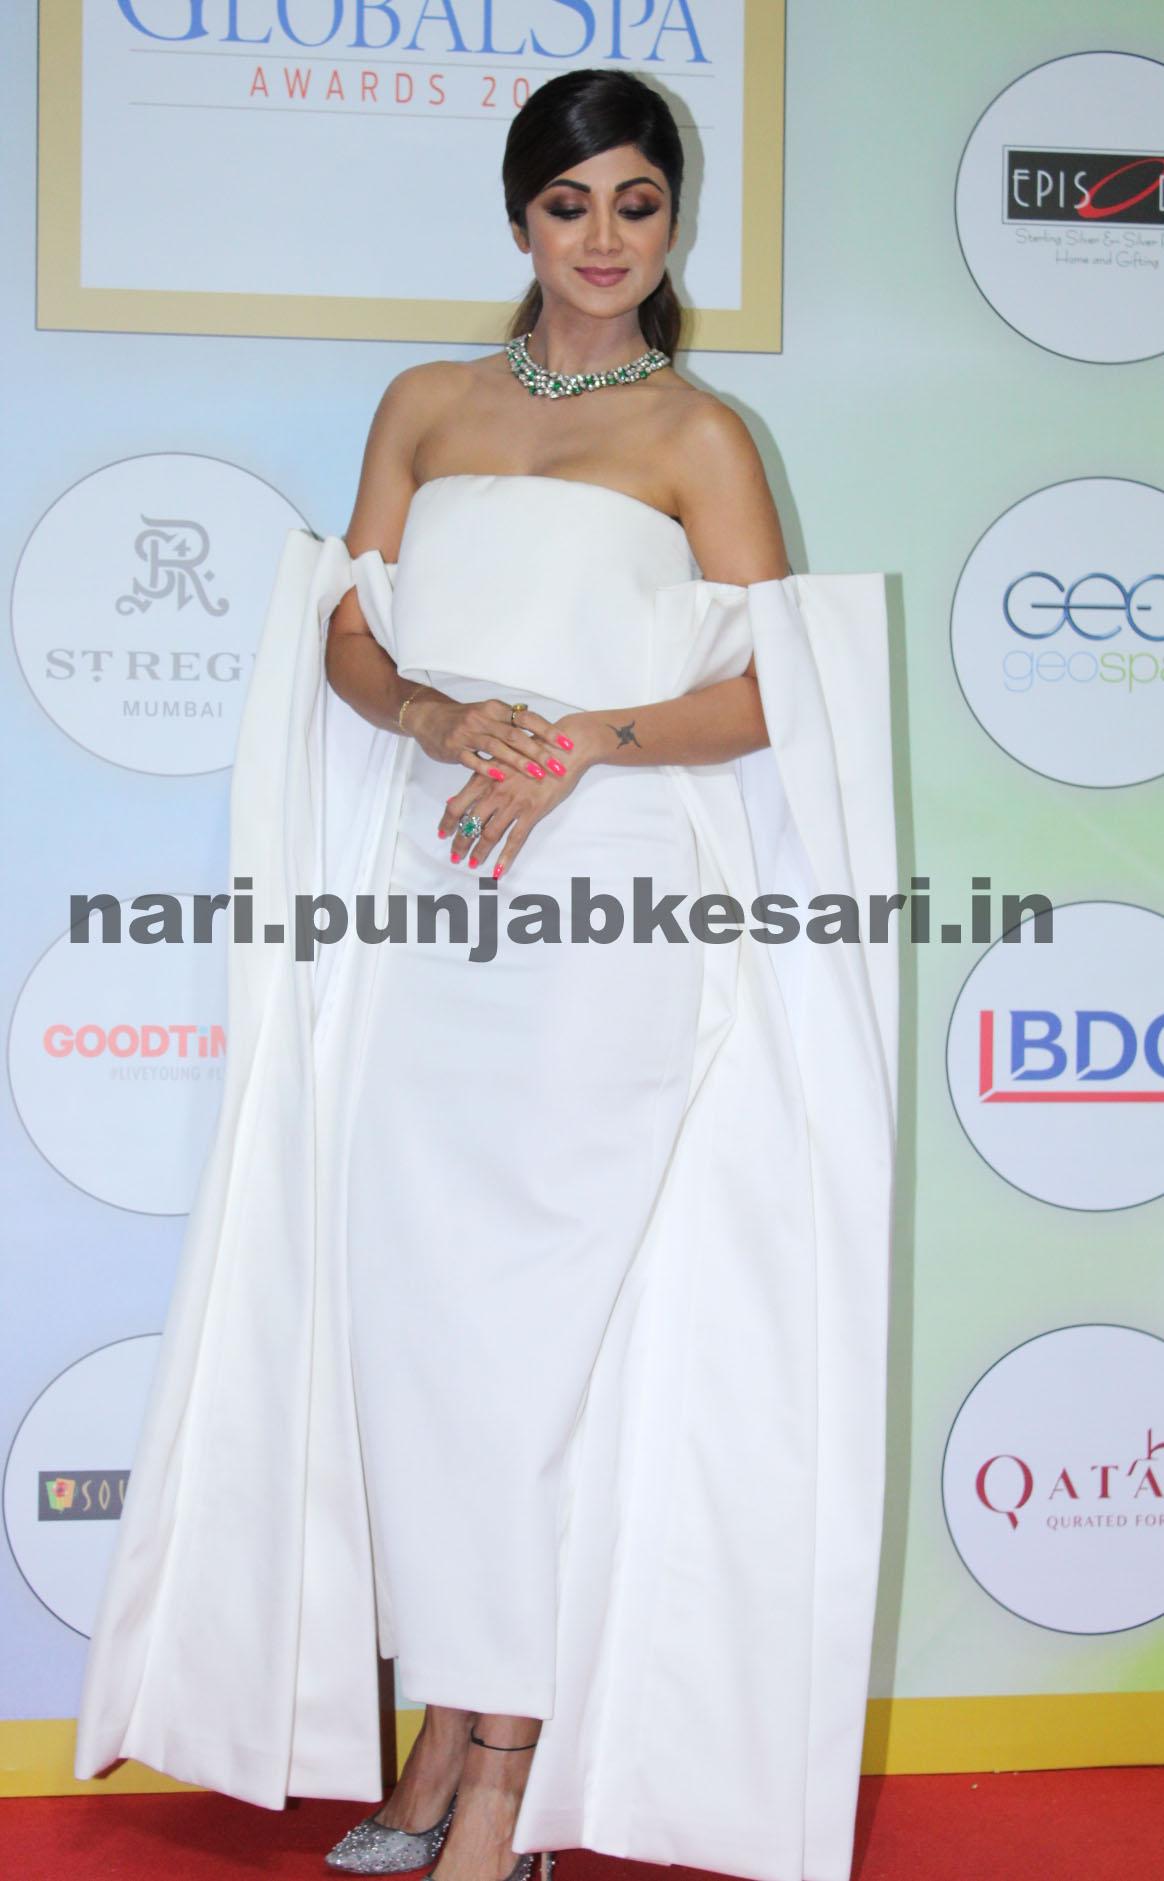 PunjabKesari, Shilpa Shetty